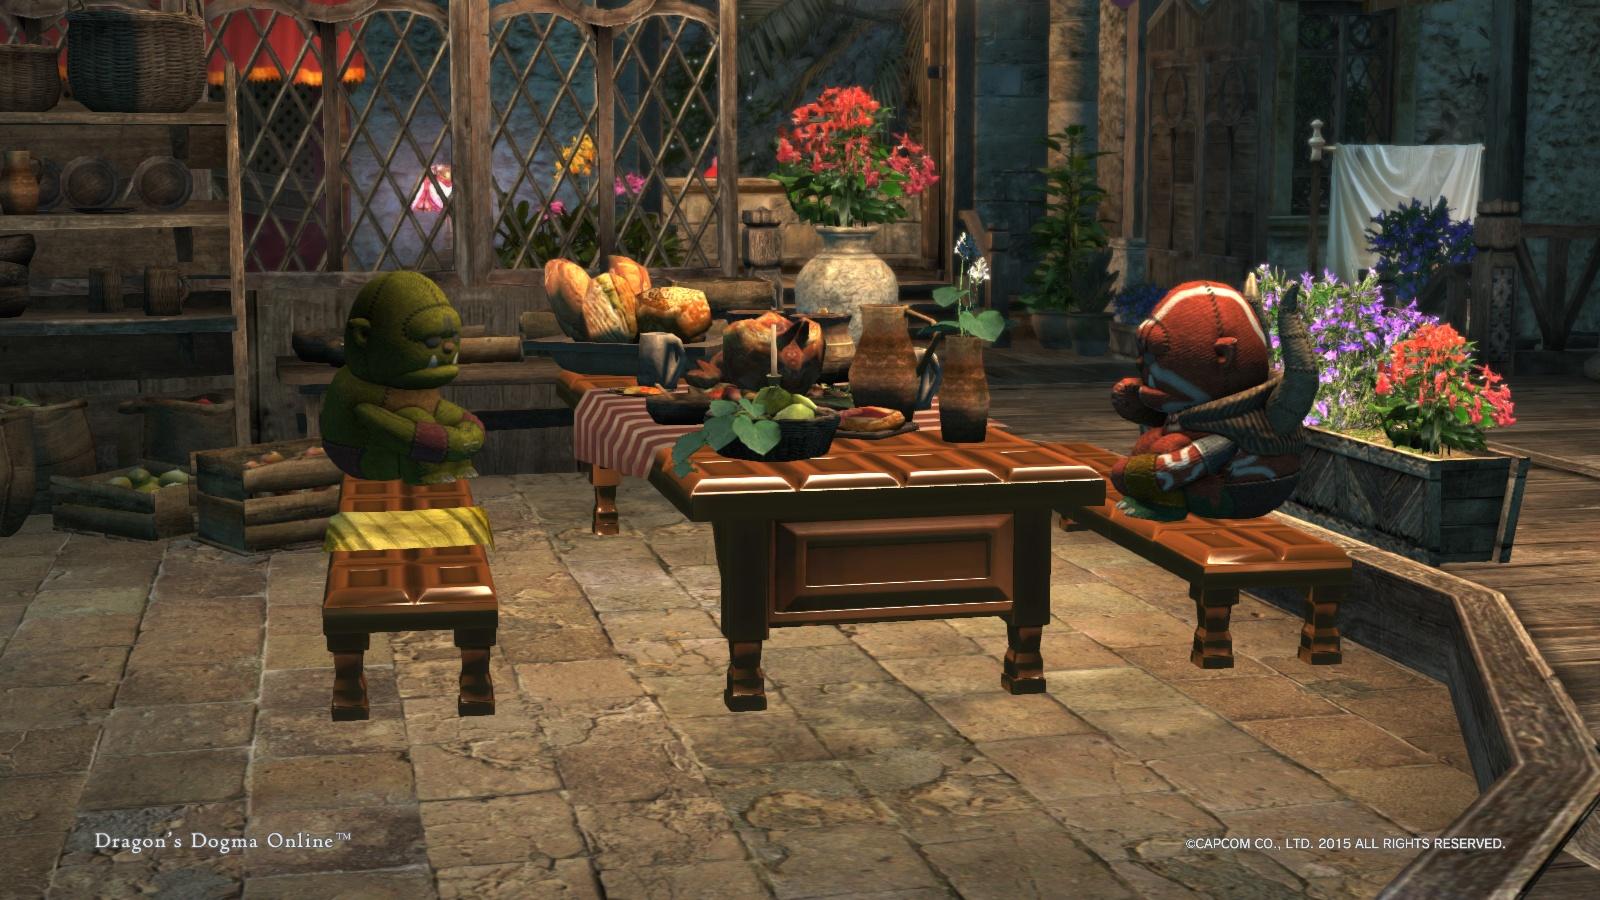 DragonsDogmaOnline_1486209040.jpg